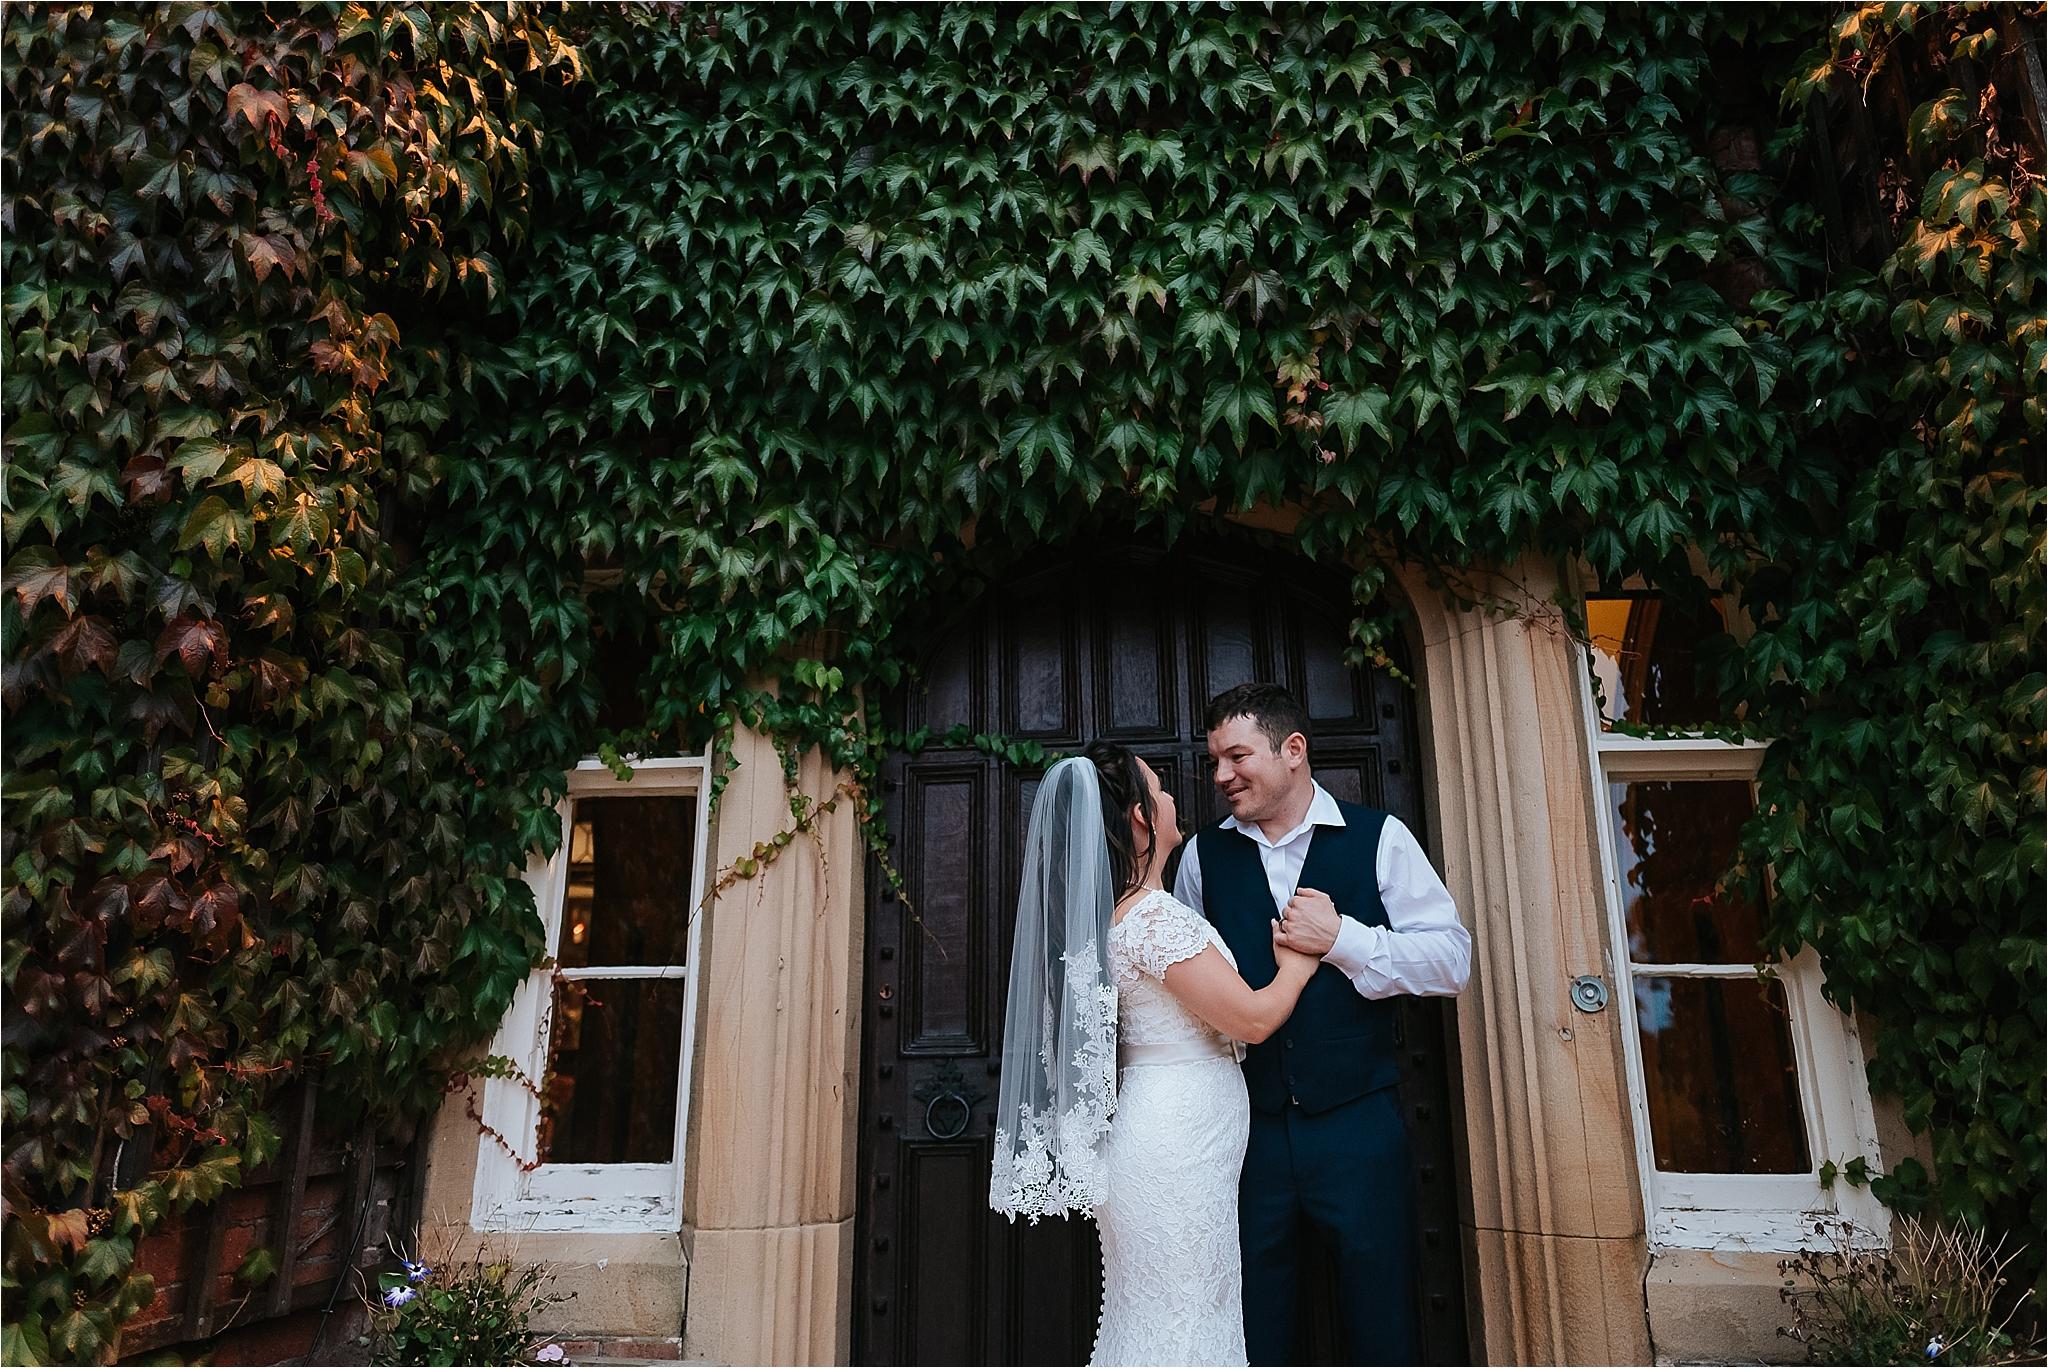 thevilla+lancashire+wreagreen+wedding+photographer113.jpg